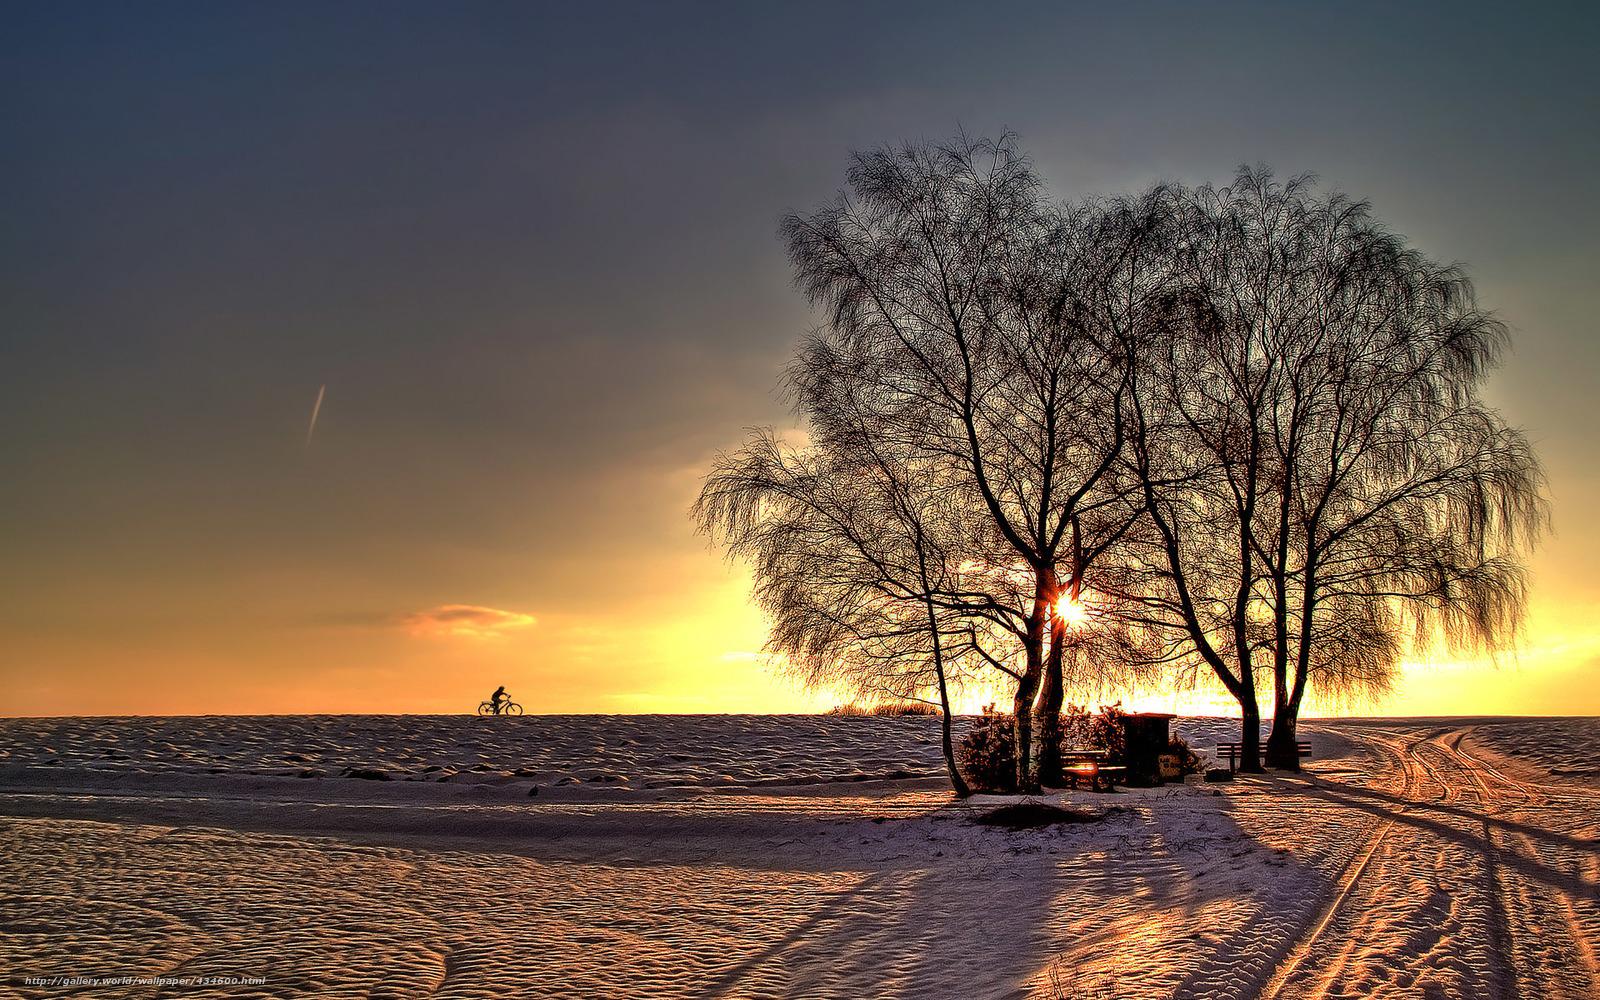 tlcharger fond d 39 ecran magnifique coucher de soleil arbres ciel paysage fonds d 39 ecran. Black Bedroom Furniture Sets. Home Design Ideas